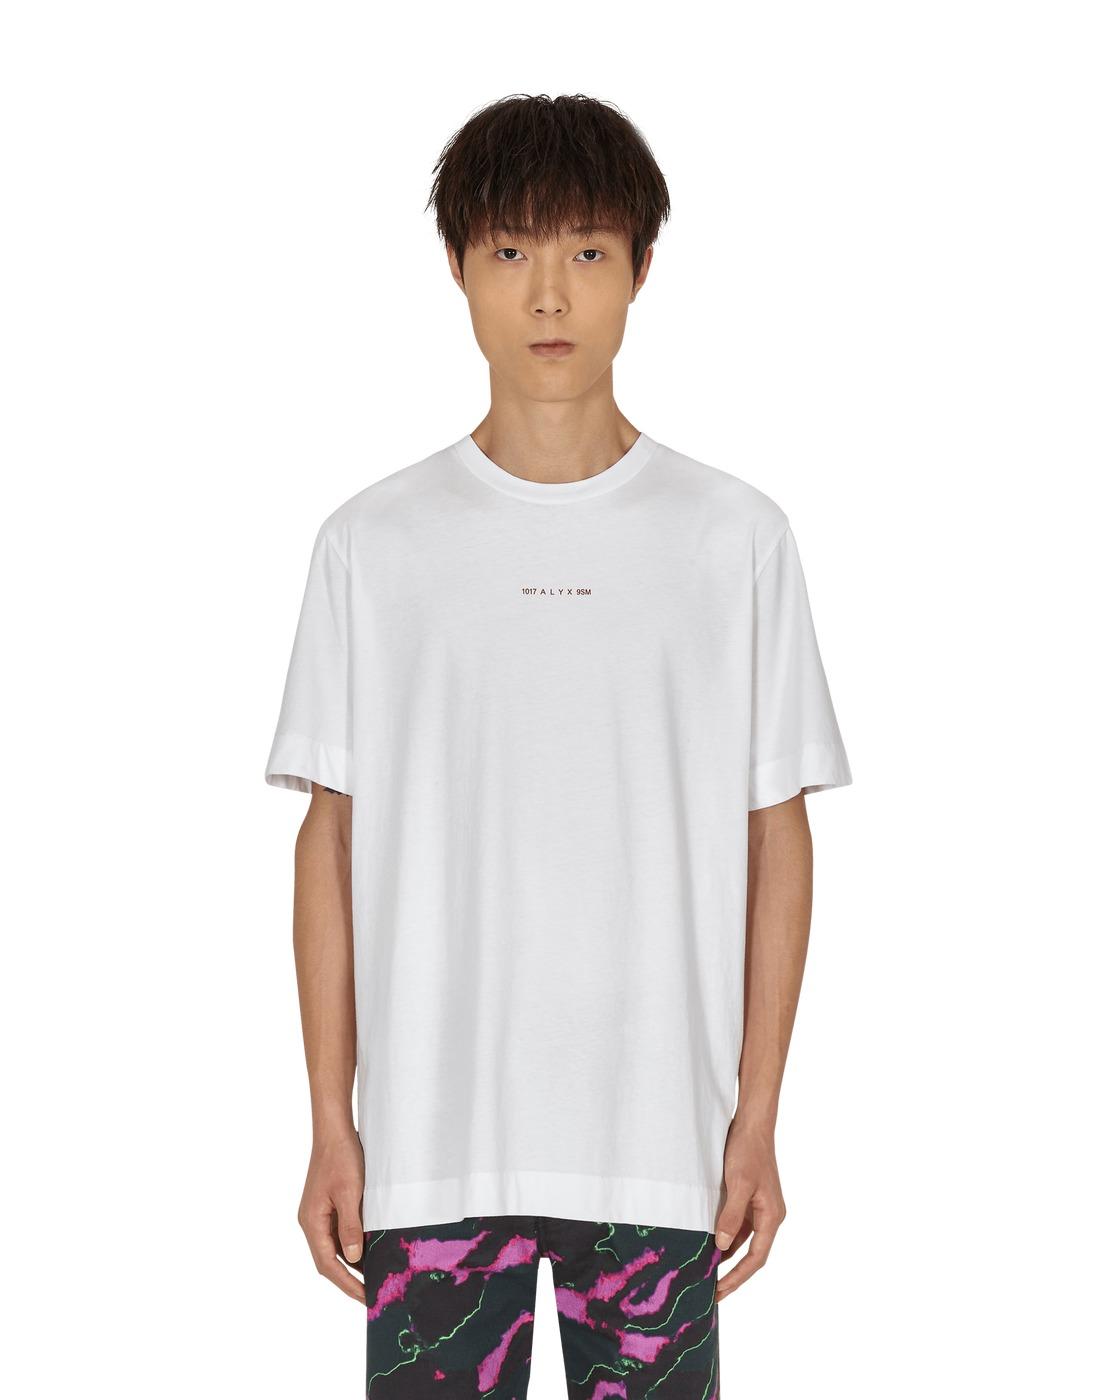 Photo: 1017 Alyx 9sm Change Of Heart T Shirt